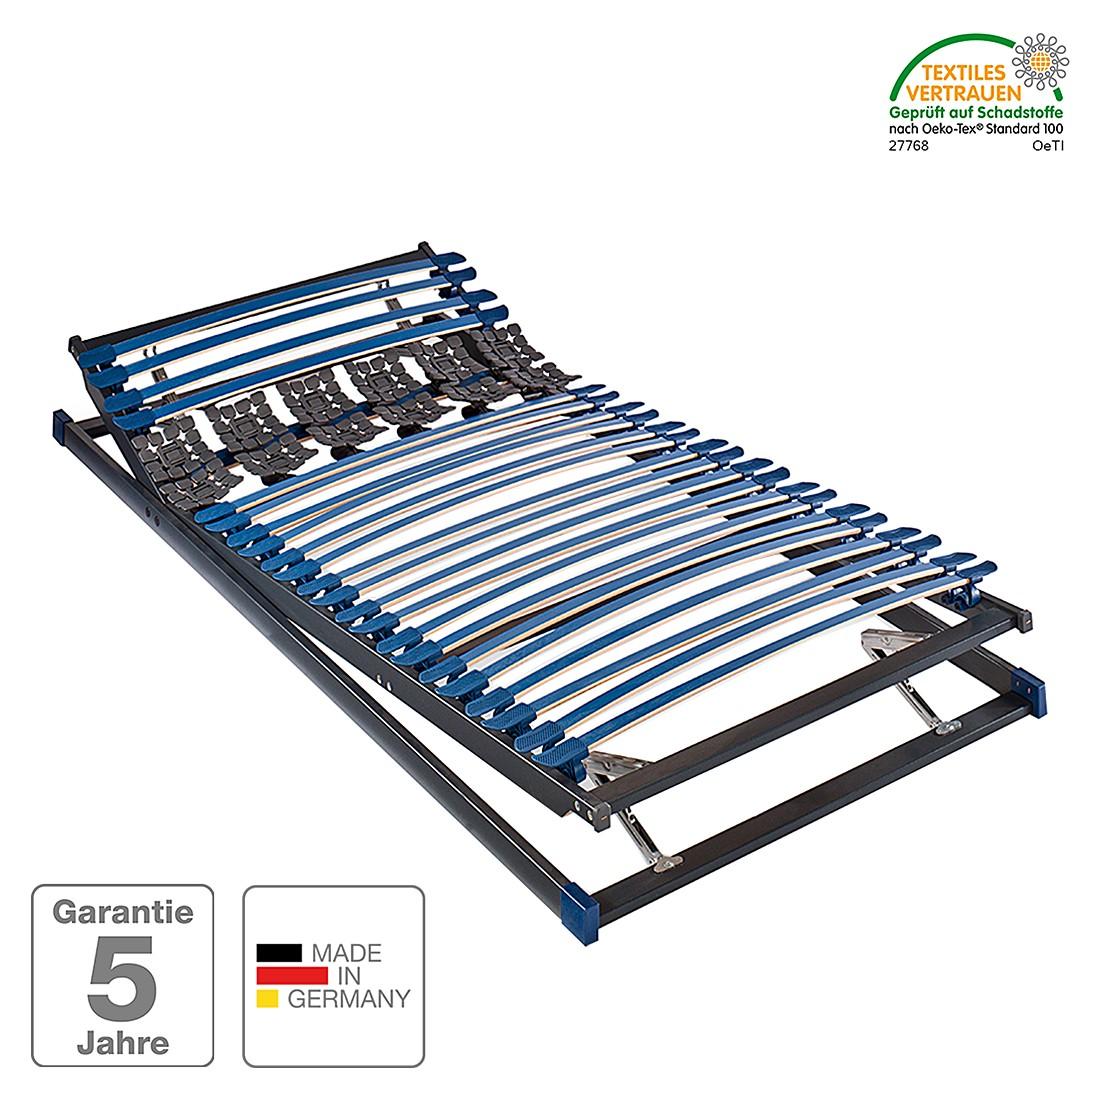 Federholz-Modullattenrost AquaFlex 100 – verstellbar – 140 x 190cm, Dunlopillo kaufen